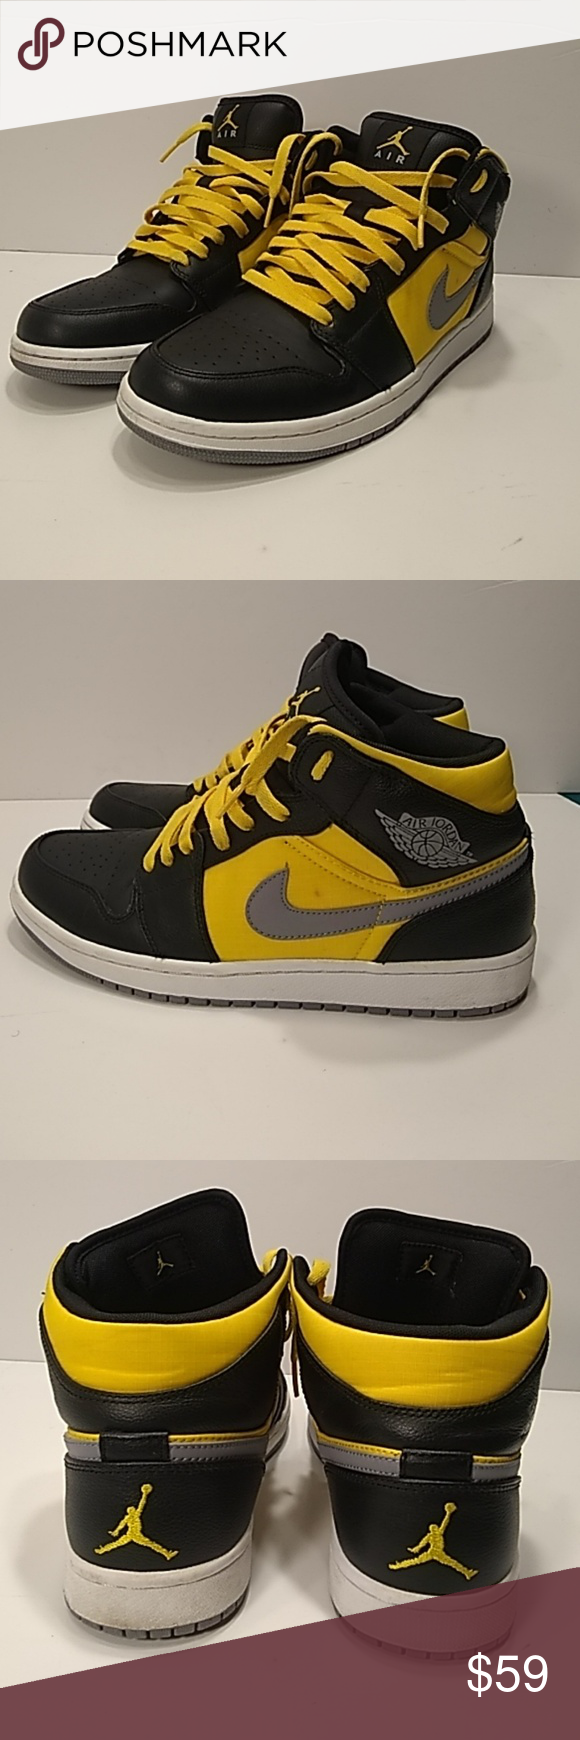 Air Jordan 1 PHAT Black Yellow Mid Sz. 9.5 Air Jordan 1 Phat 364770-50.  Black Stealth 1570a92369a6